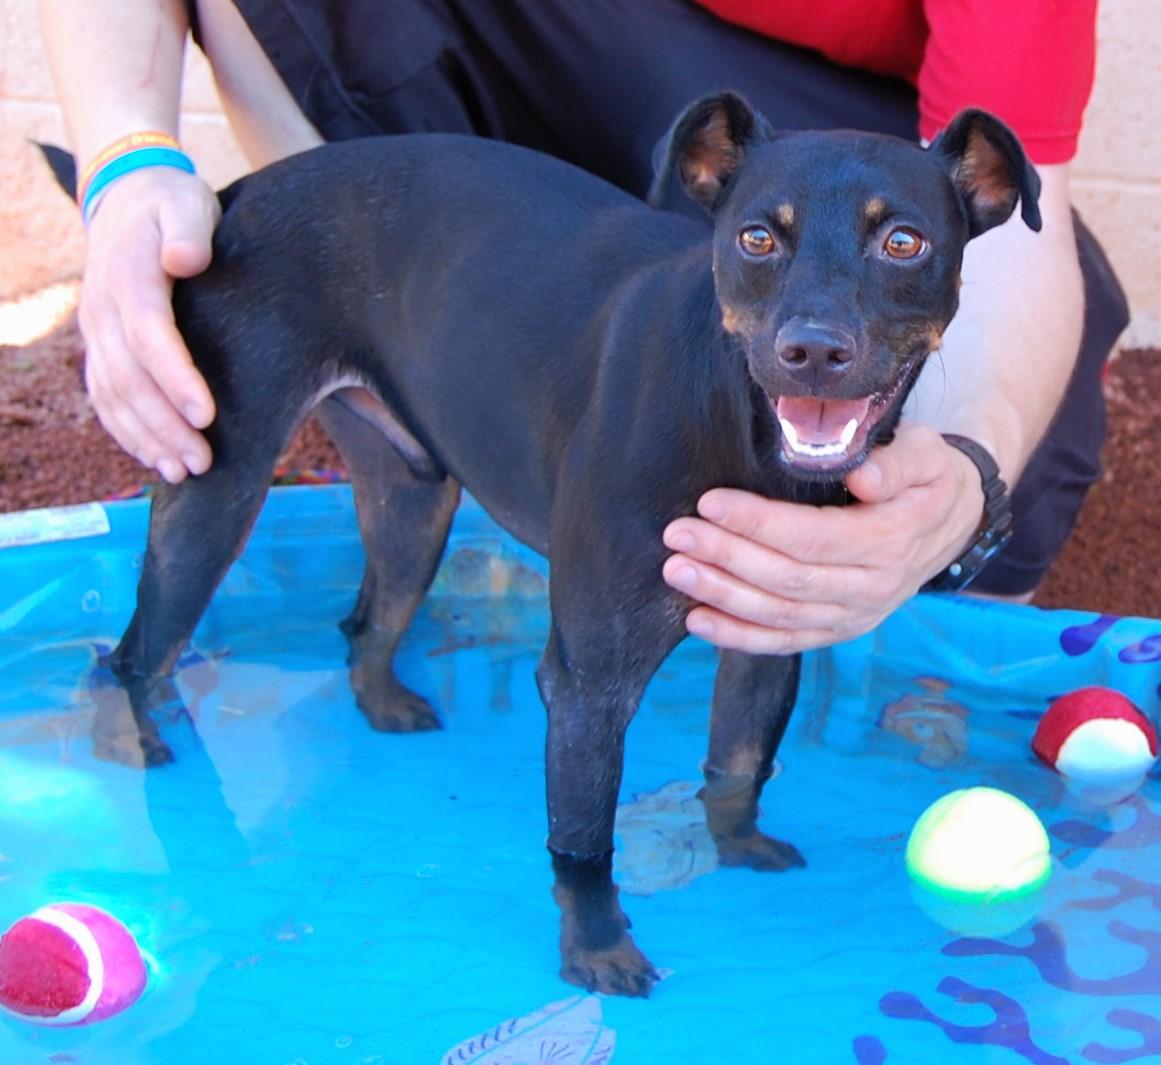 Las vegas animal shelter adoption for Dog pound las vegas nevada